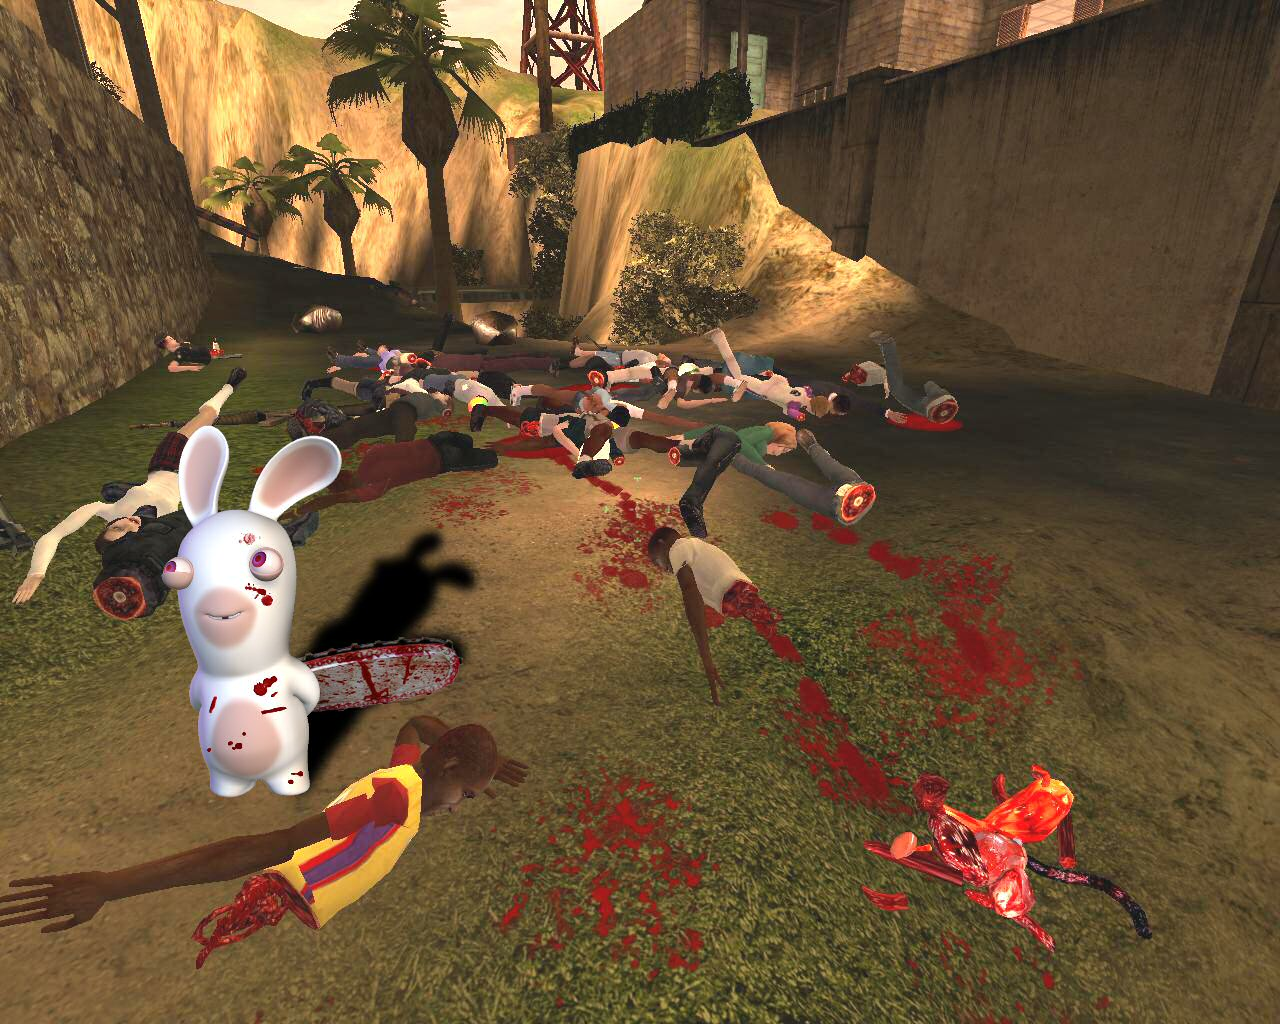 L'invasion des cretins .... Tenia_lapin_carnage